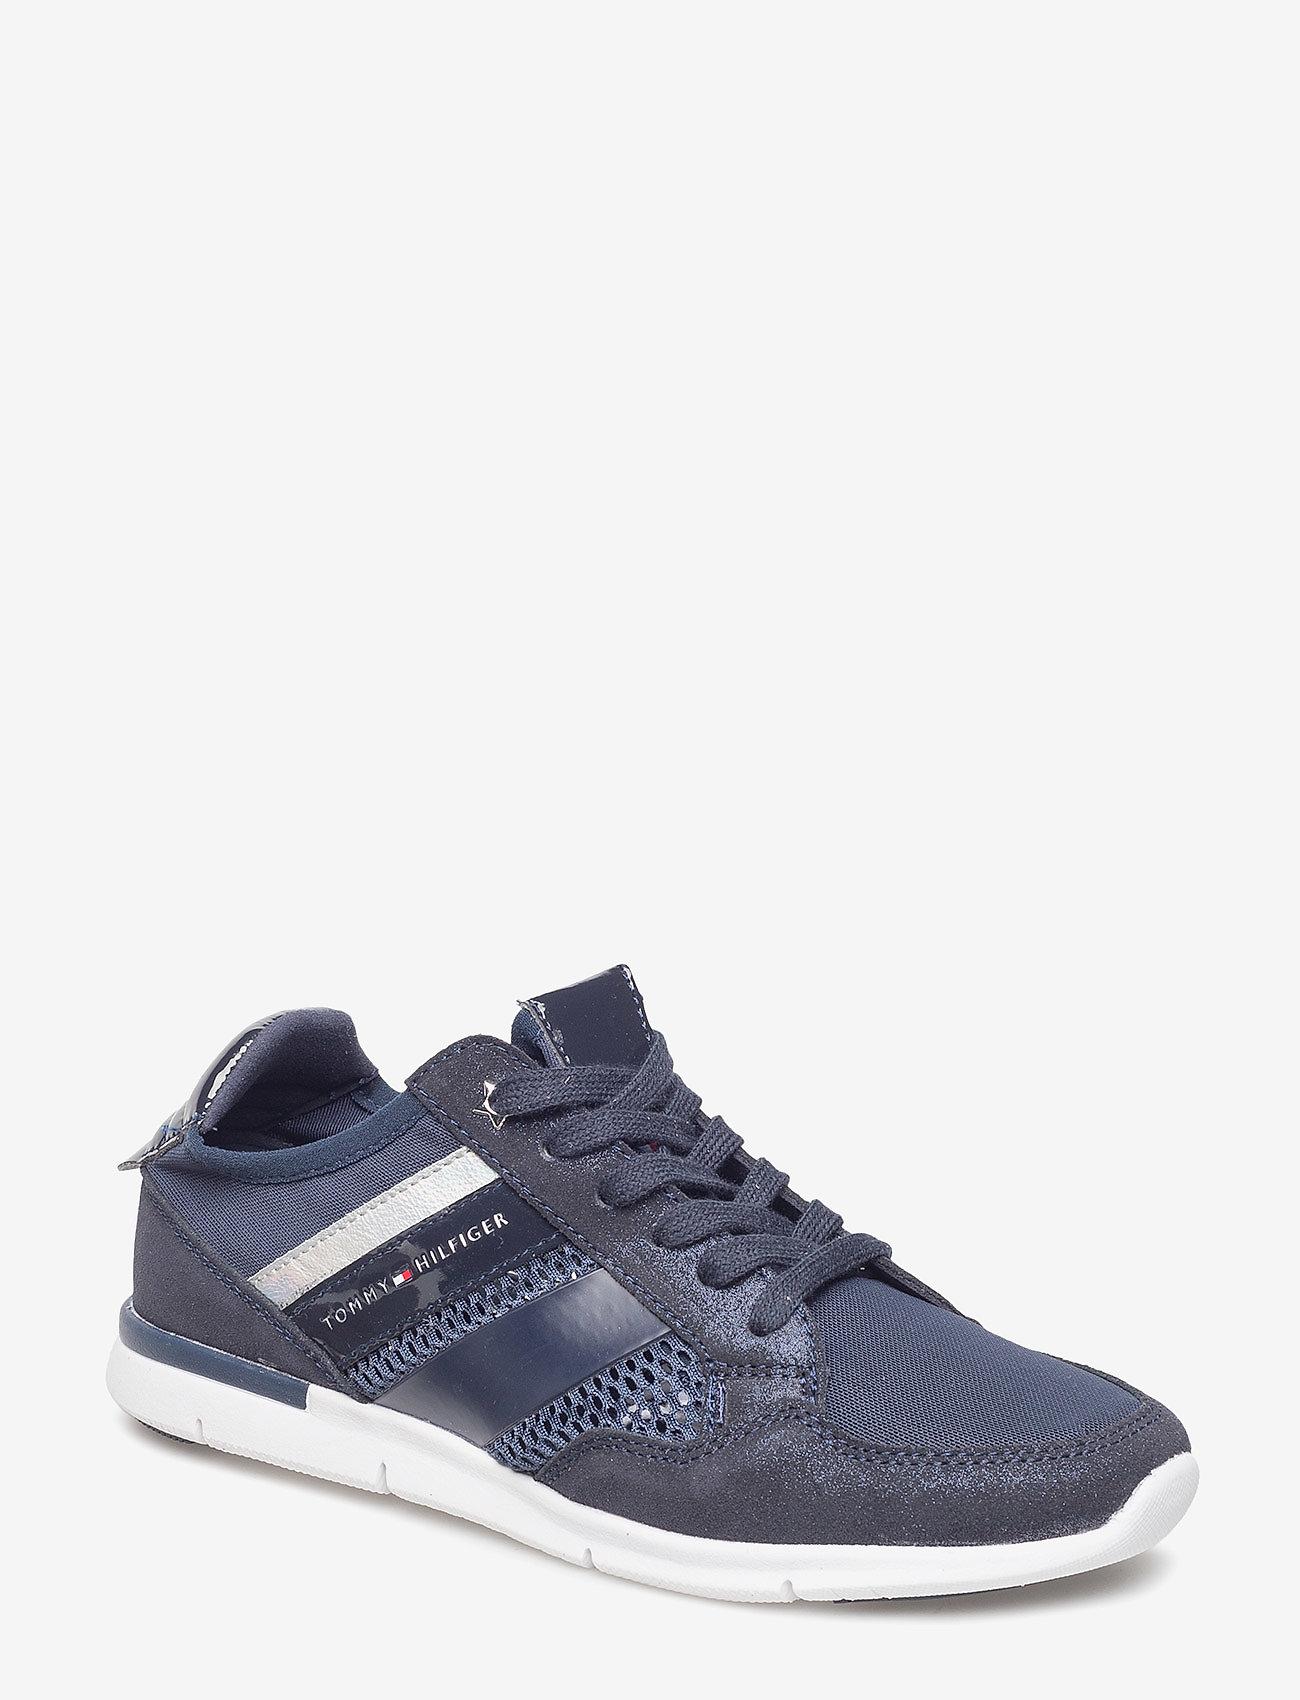 Tommy Hilfiger Skye 2c2 - Sneakers Midnight